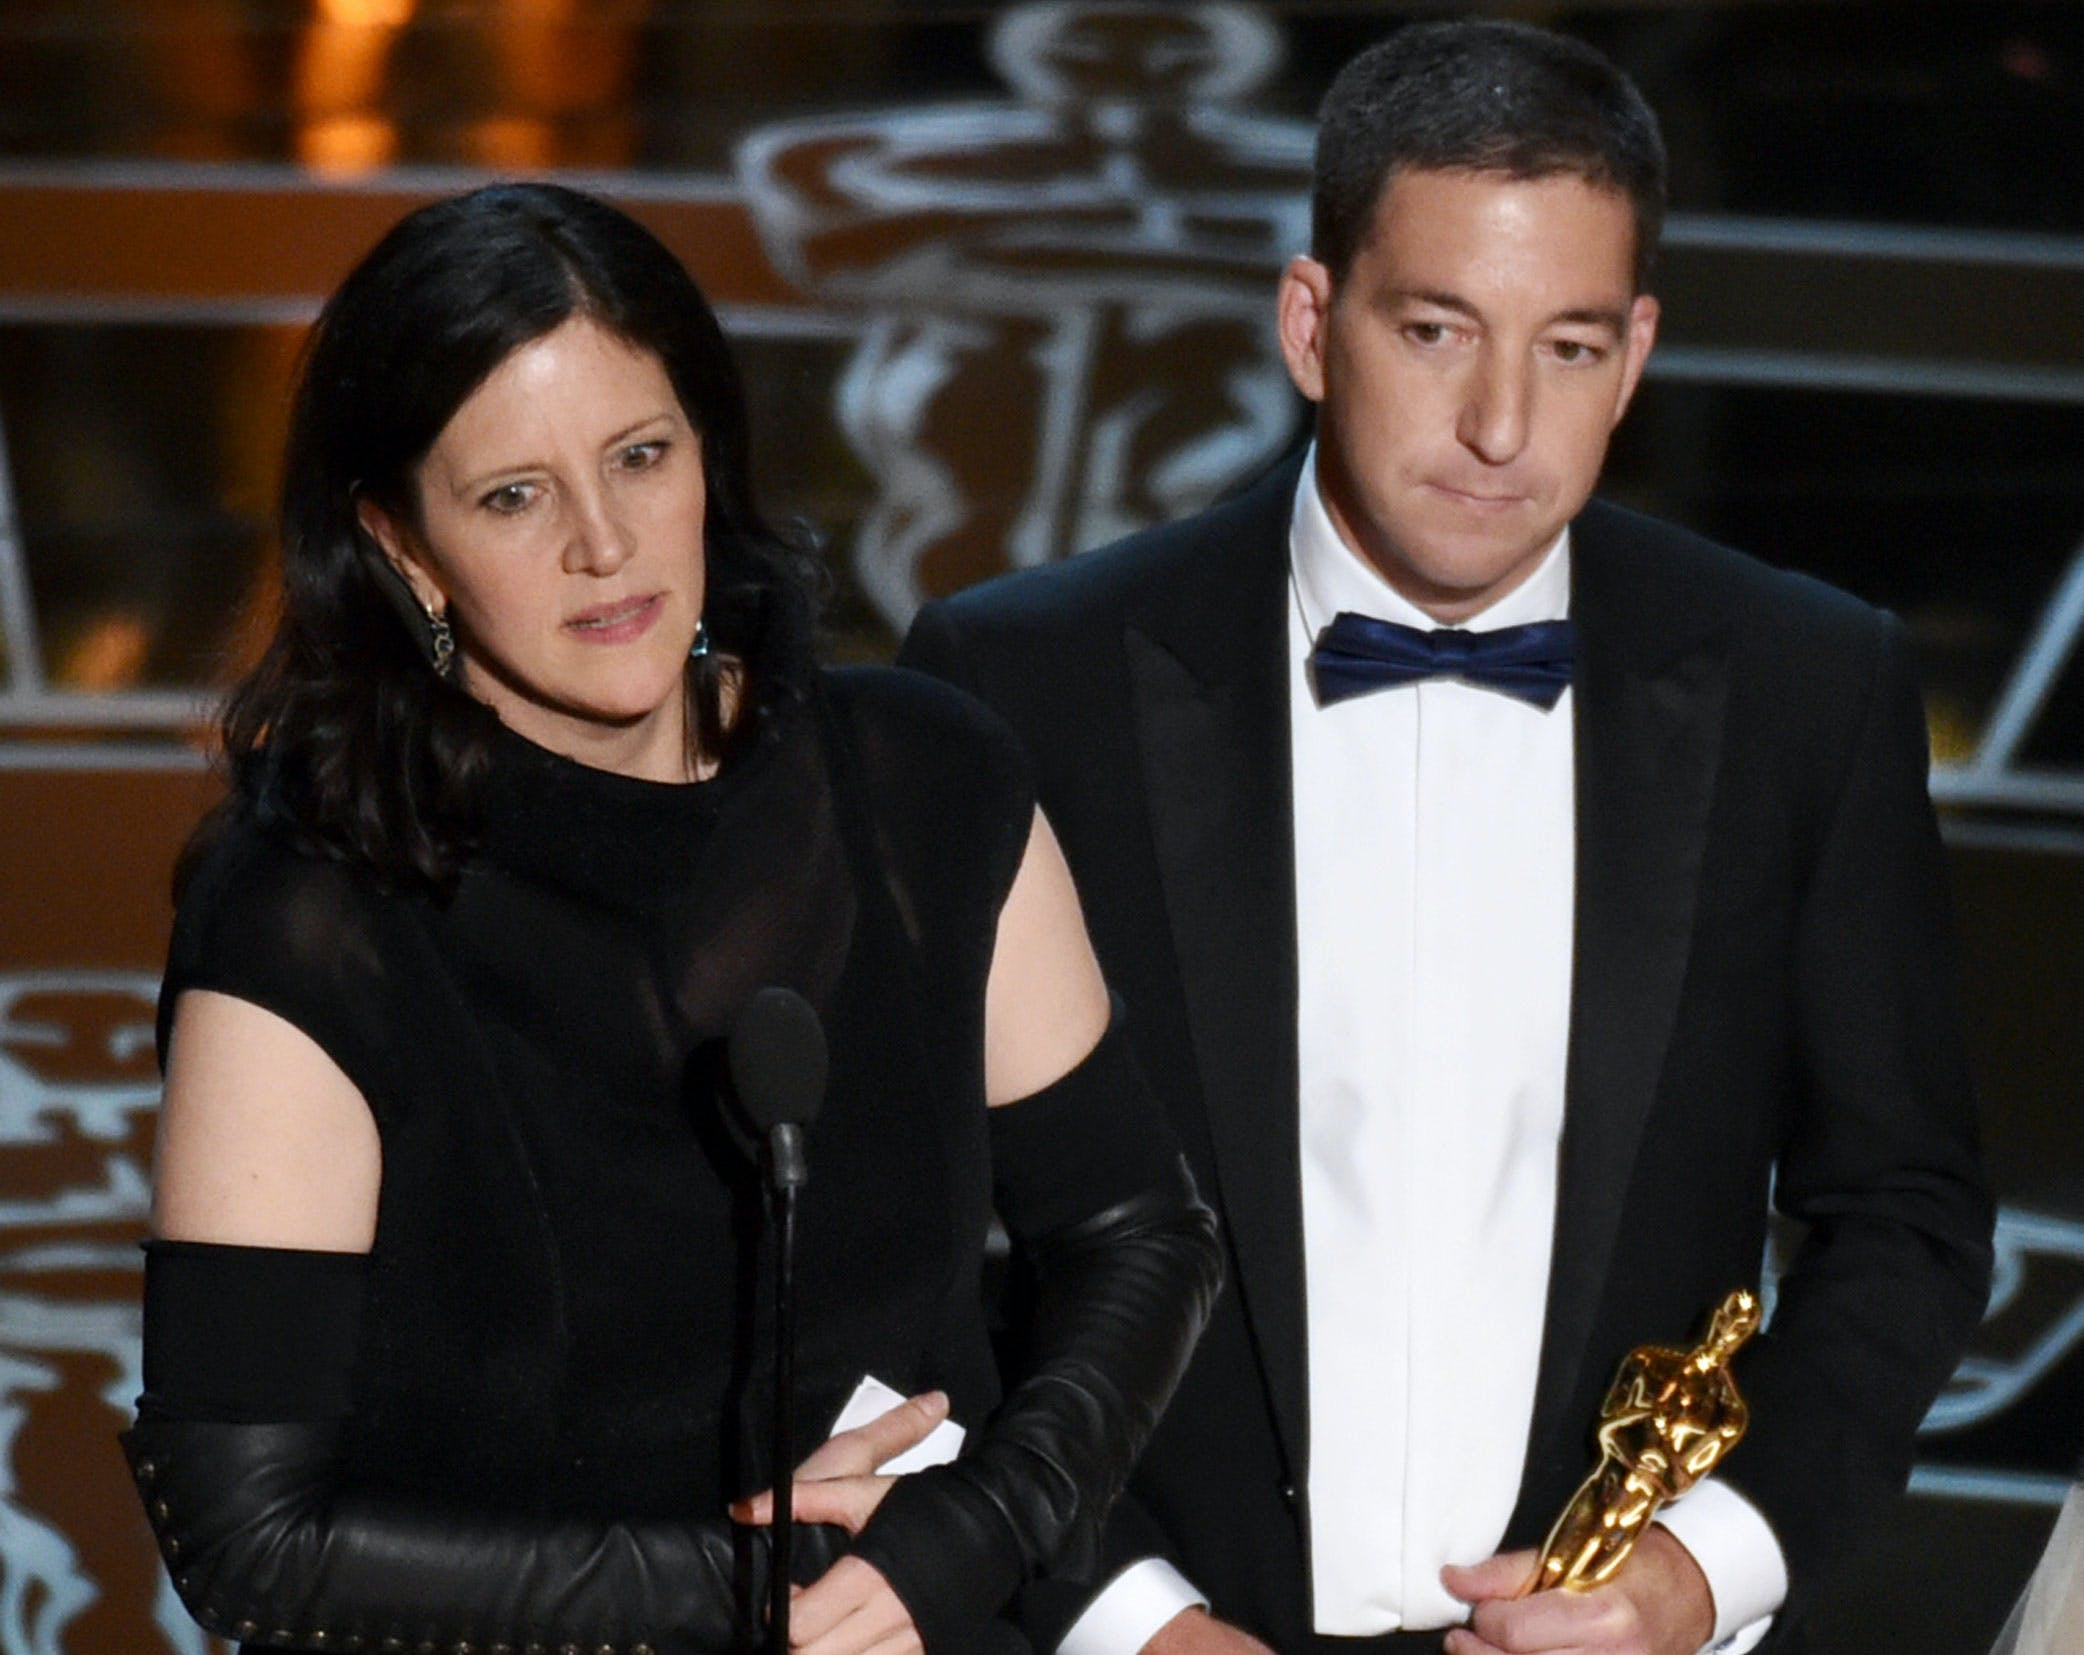 The Intercept's Laura Poitras Wins Academy Award for 'Citizenfour'